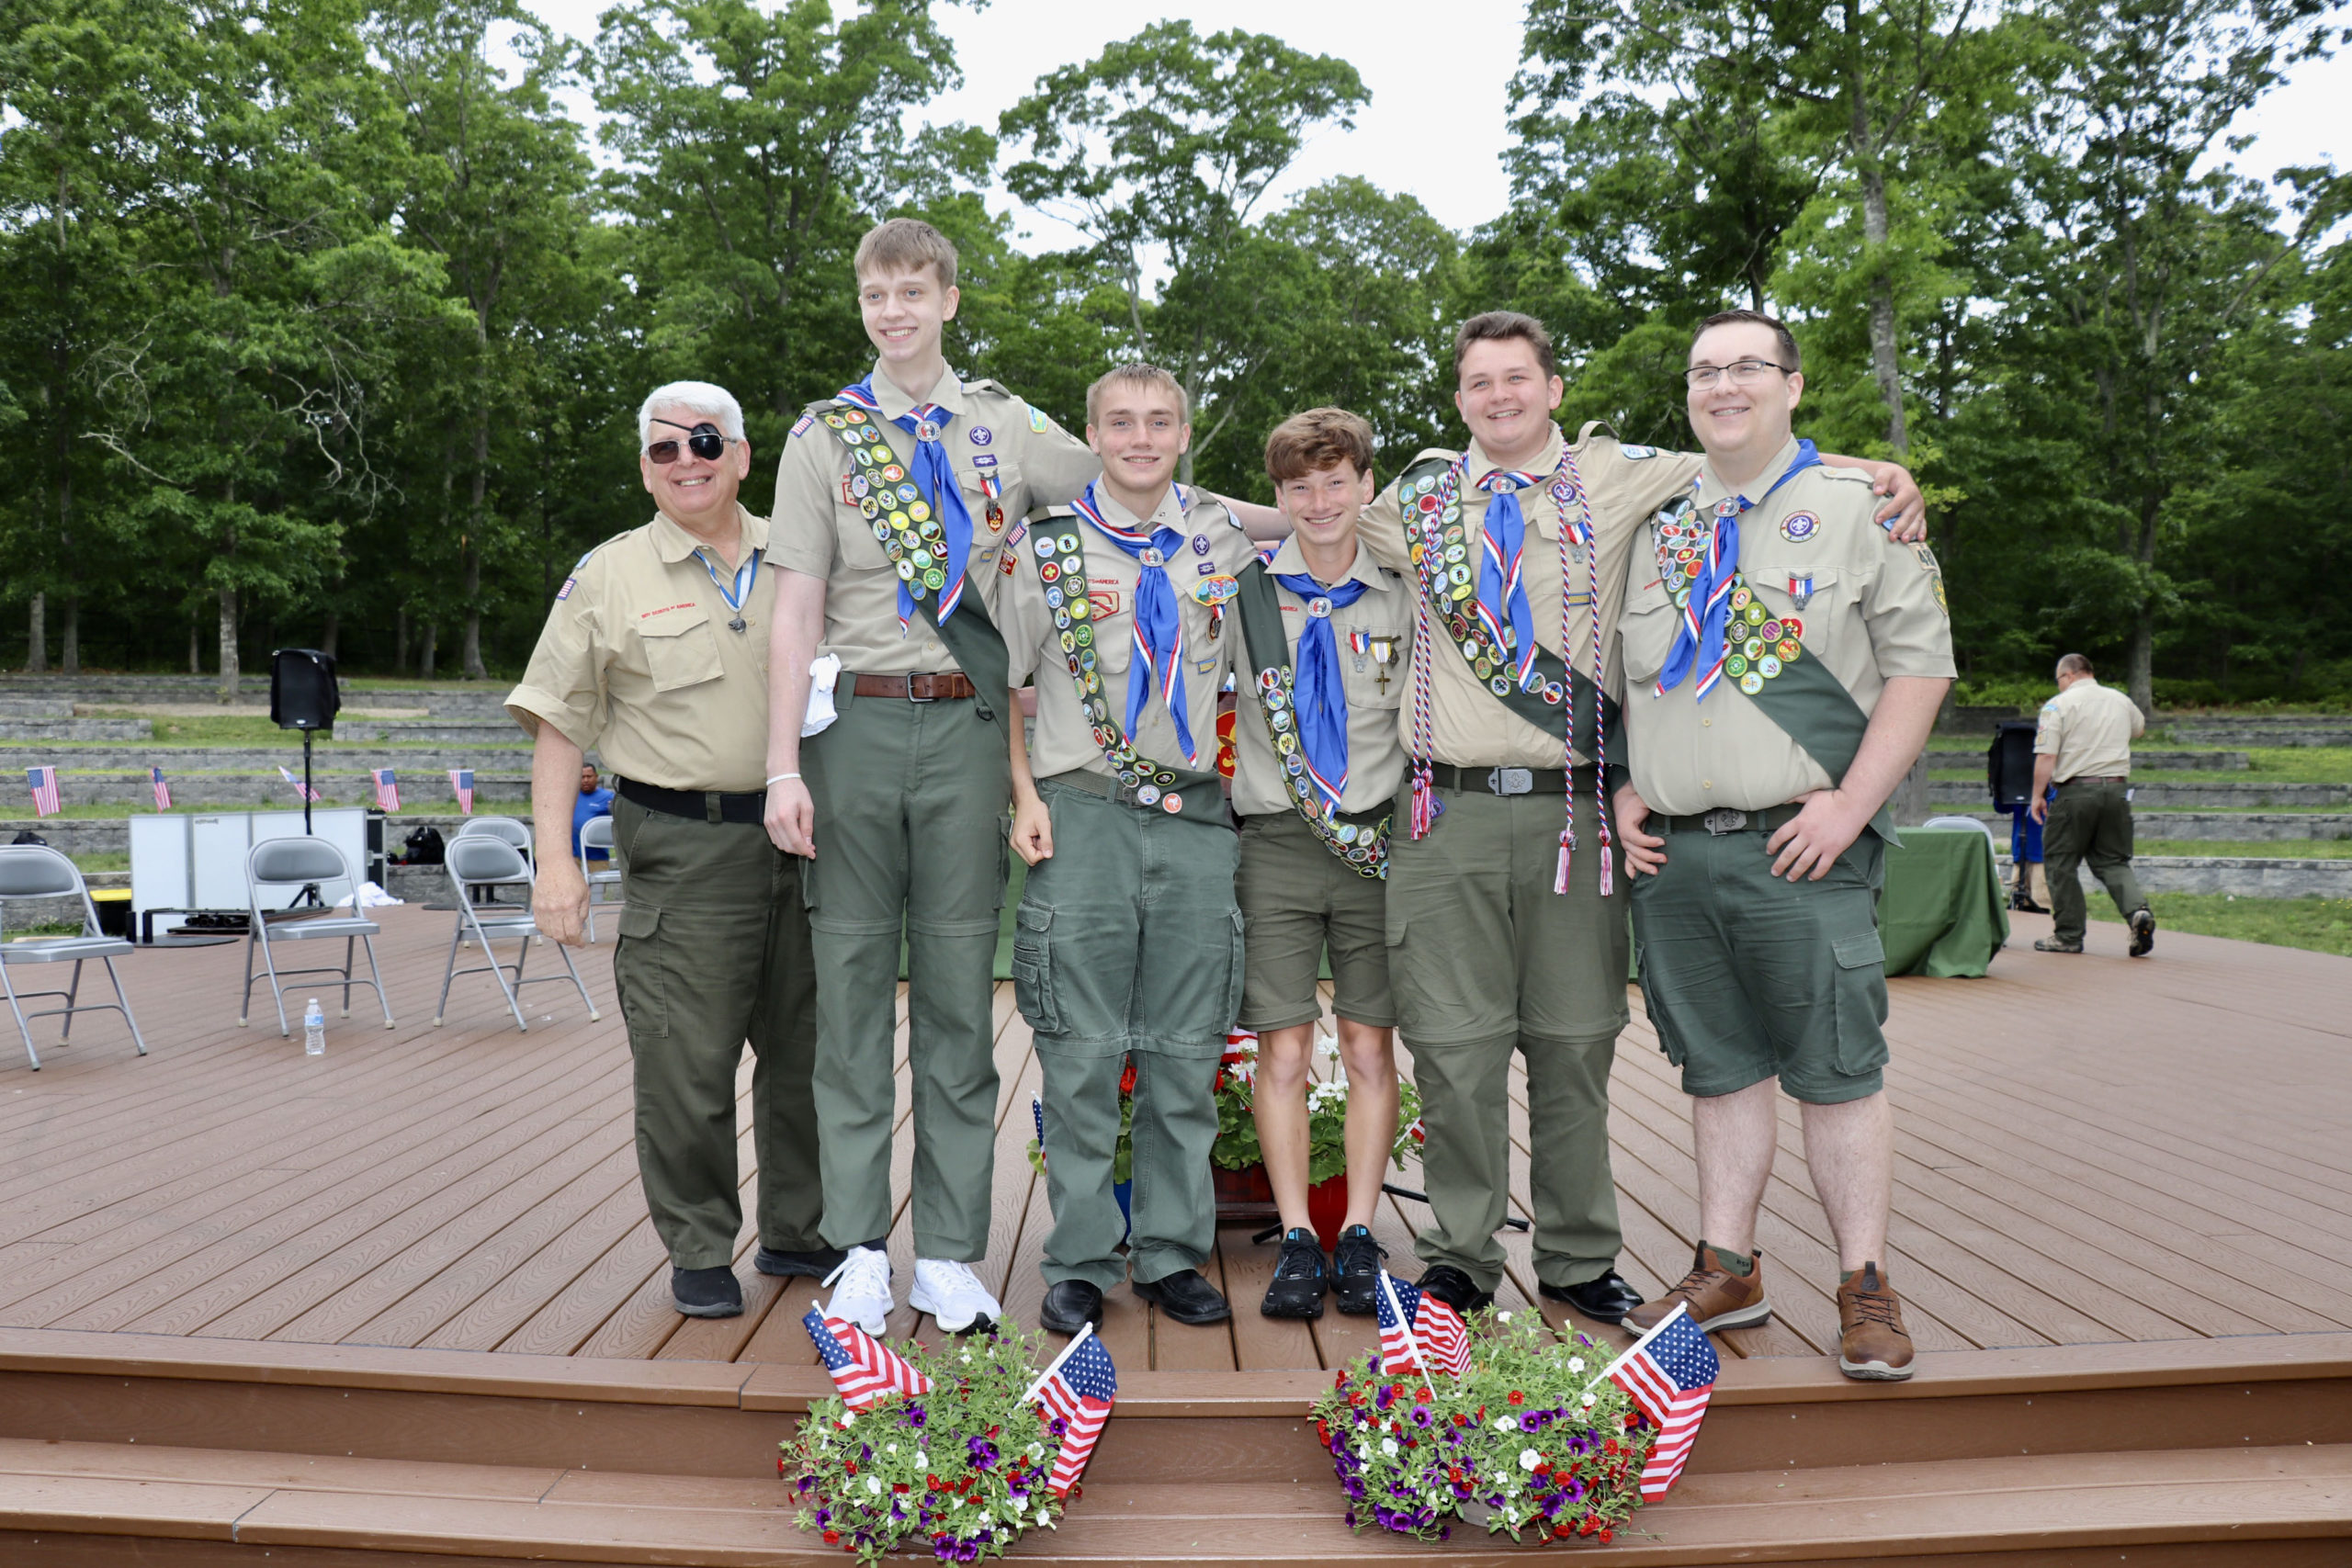 With Scoutmaster Emeritus  Allen Schneider, are, Aidan Martin, Bryan Ambrose, Maximus Haynia, Aidan Utz and Corey Hoffmann.        MARSHA TERRY